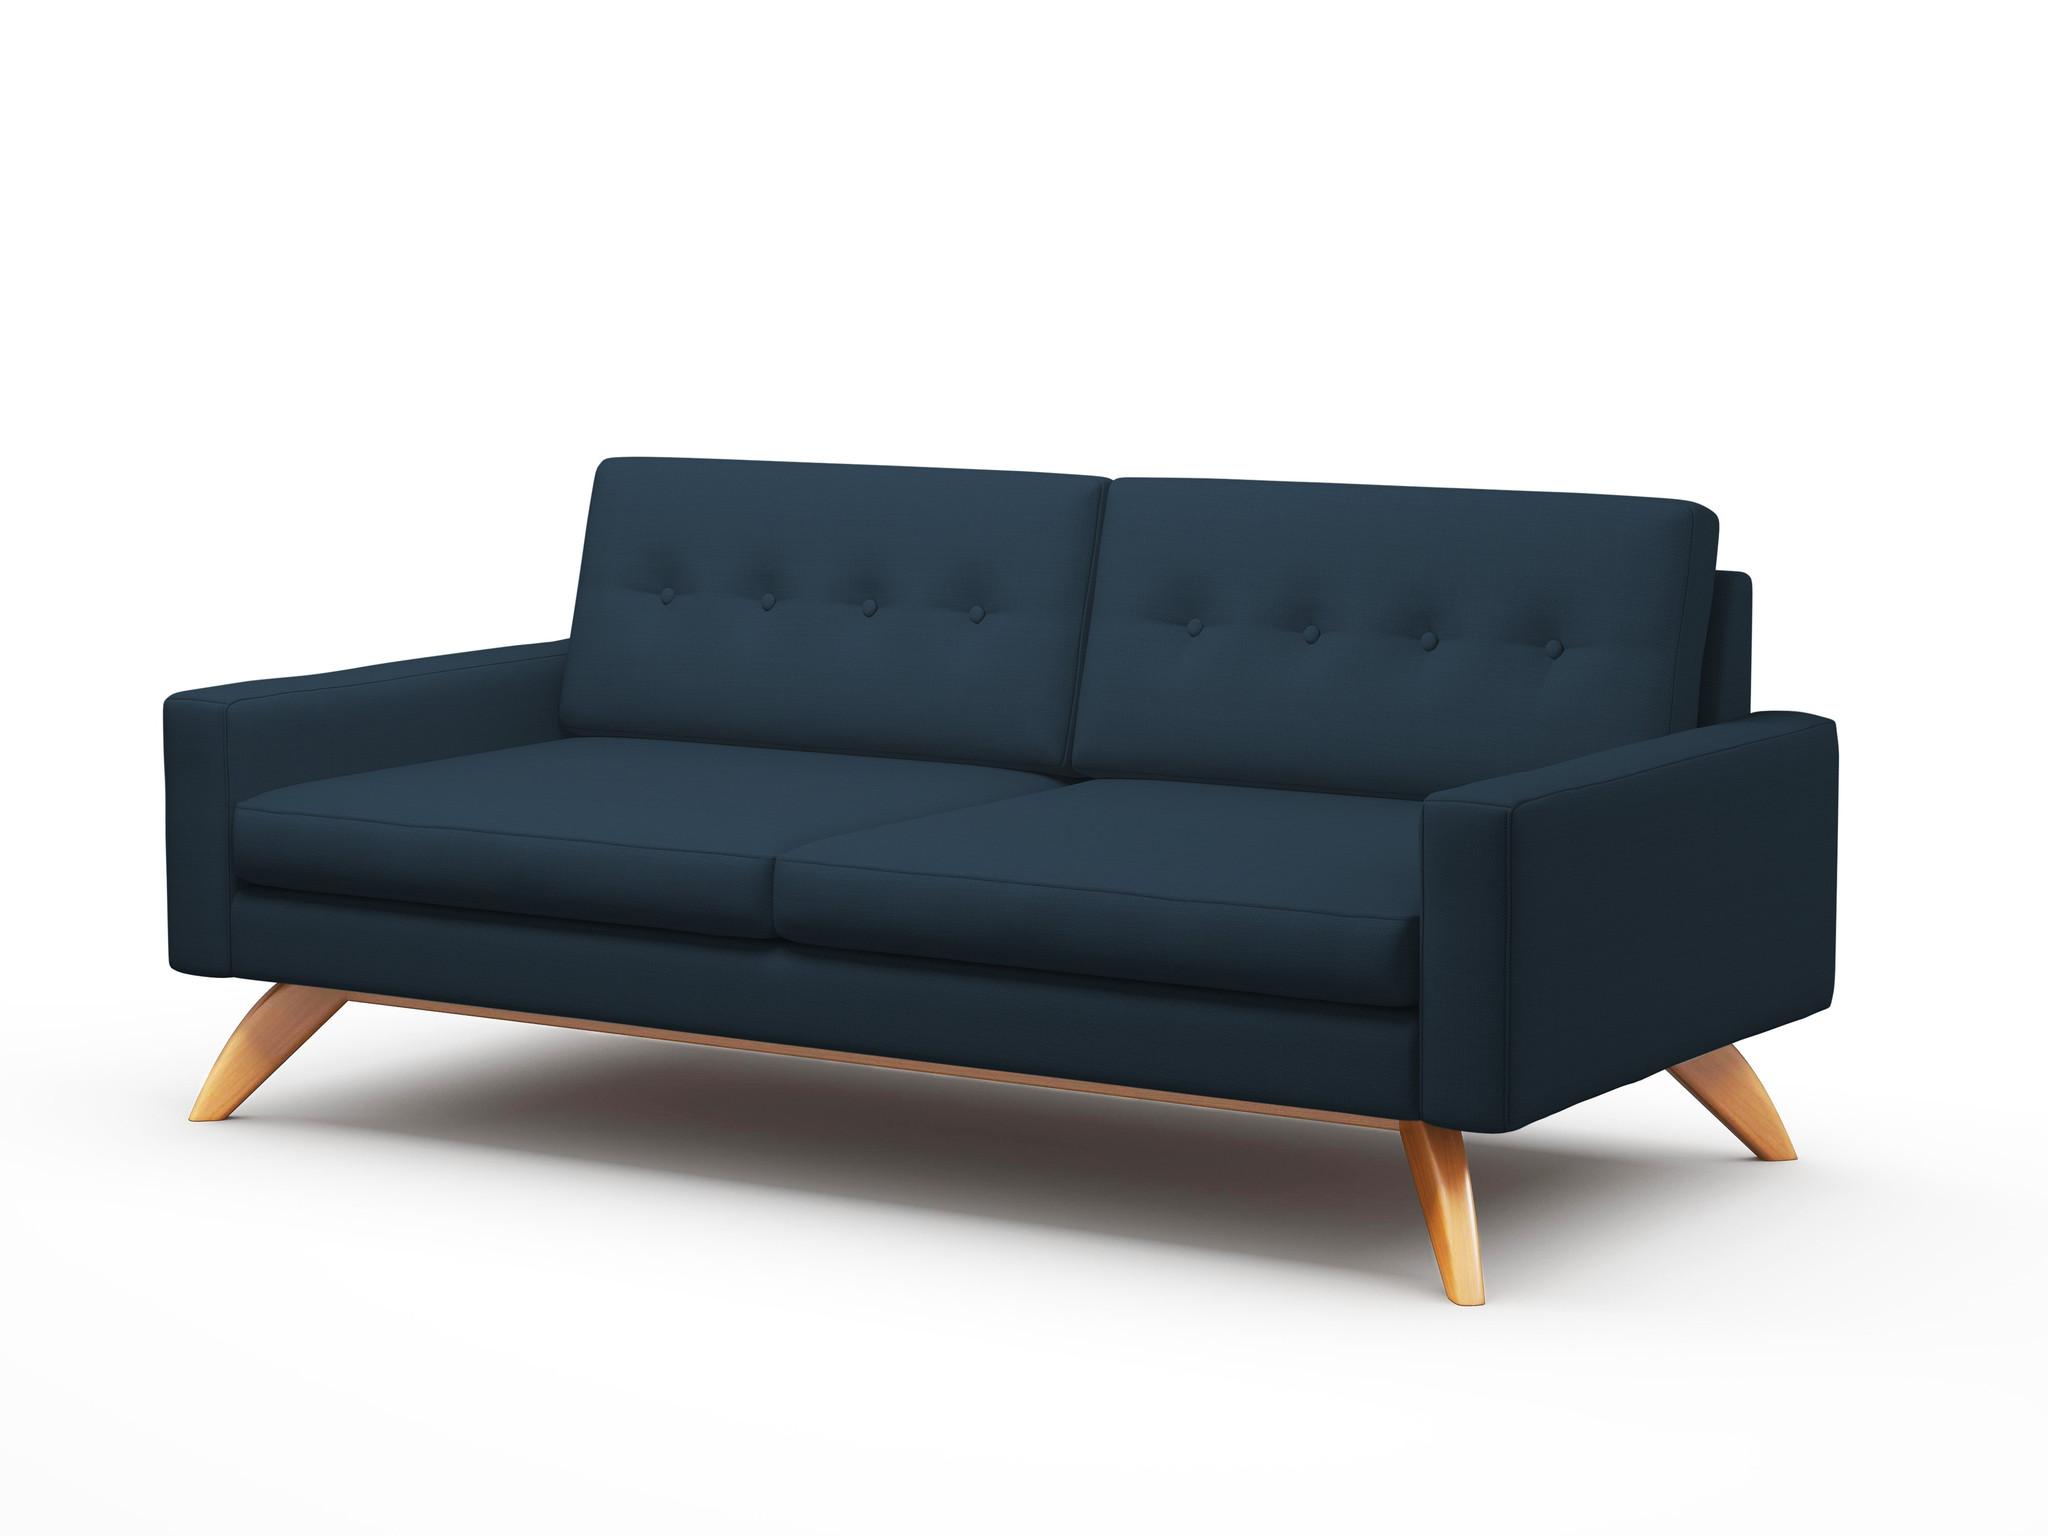 sleeper-sofa-austin-tx-photo-6